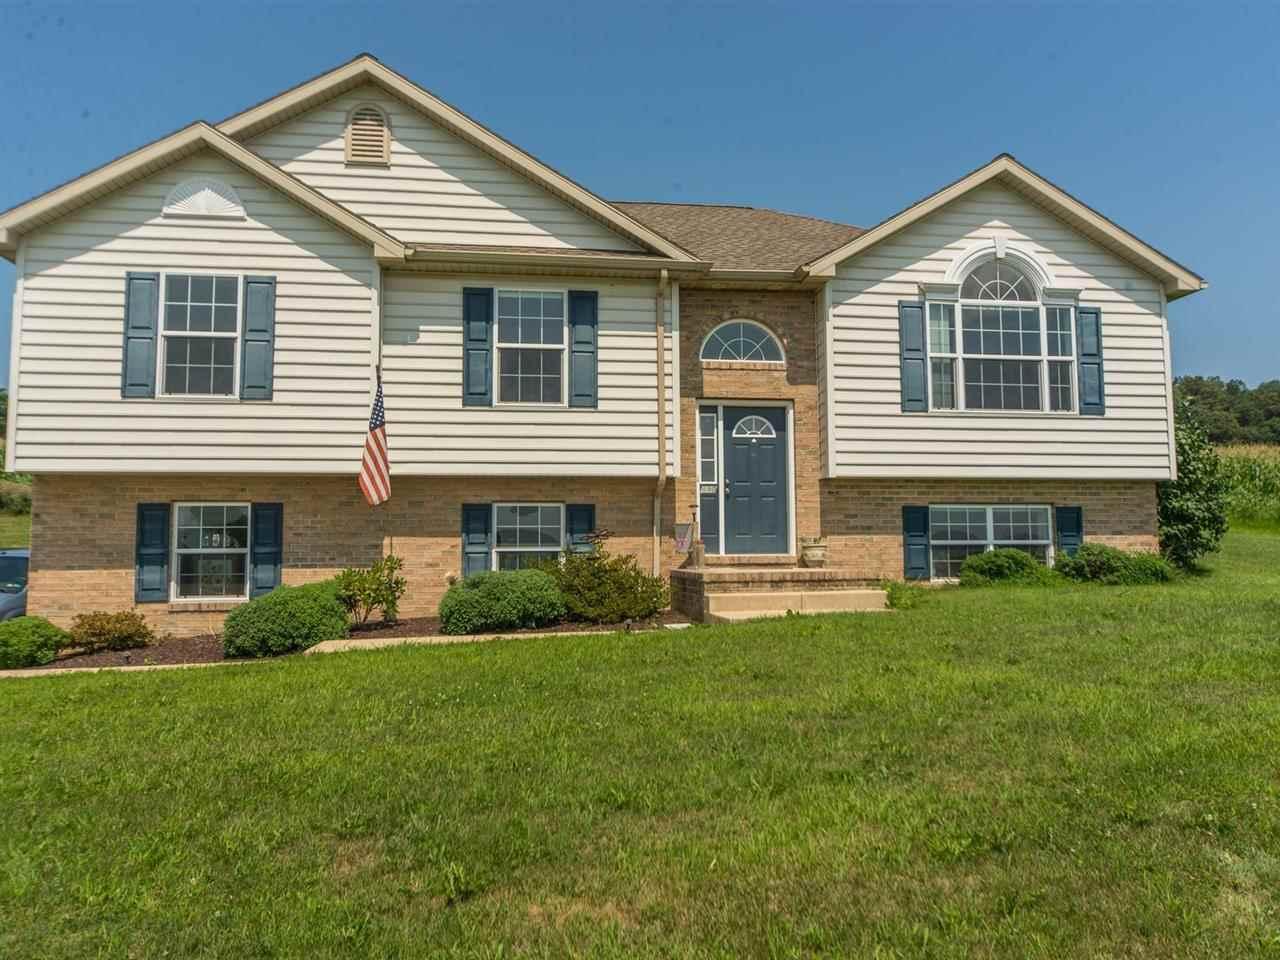 890 Rockville Rd, Spring Grove, PA 17362